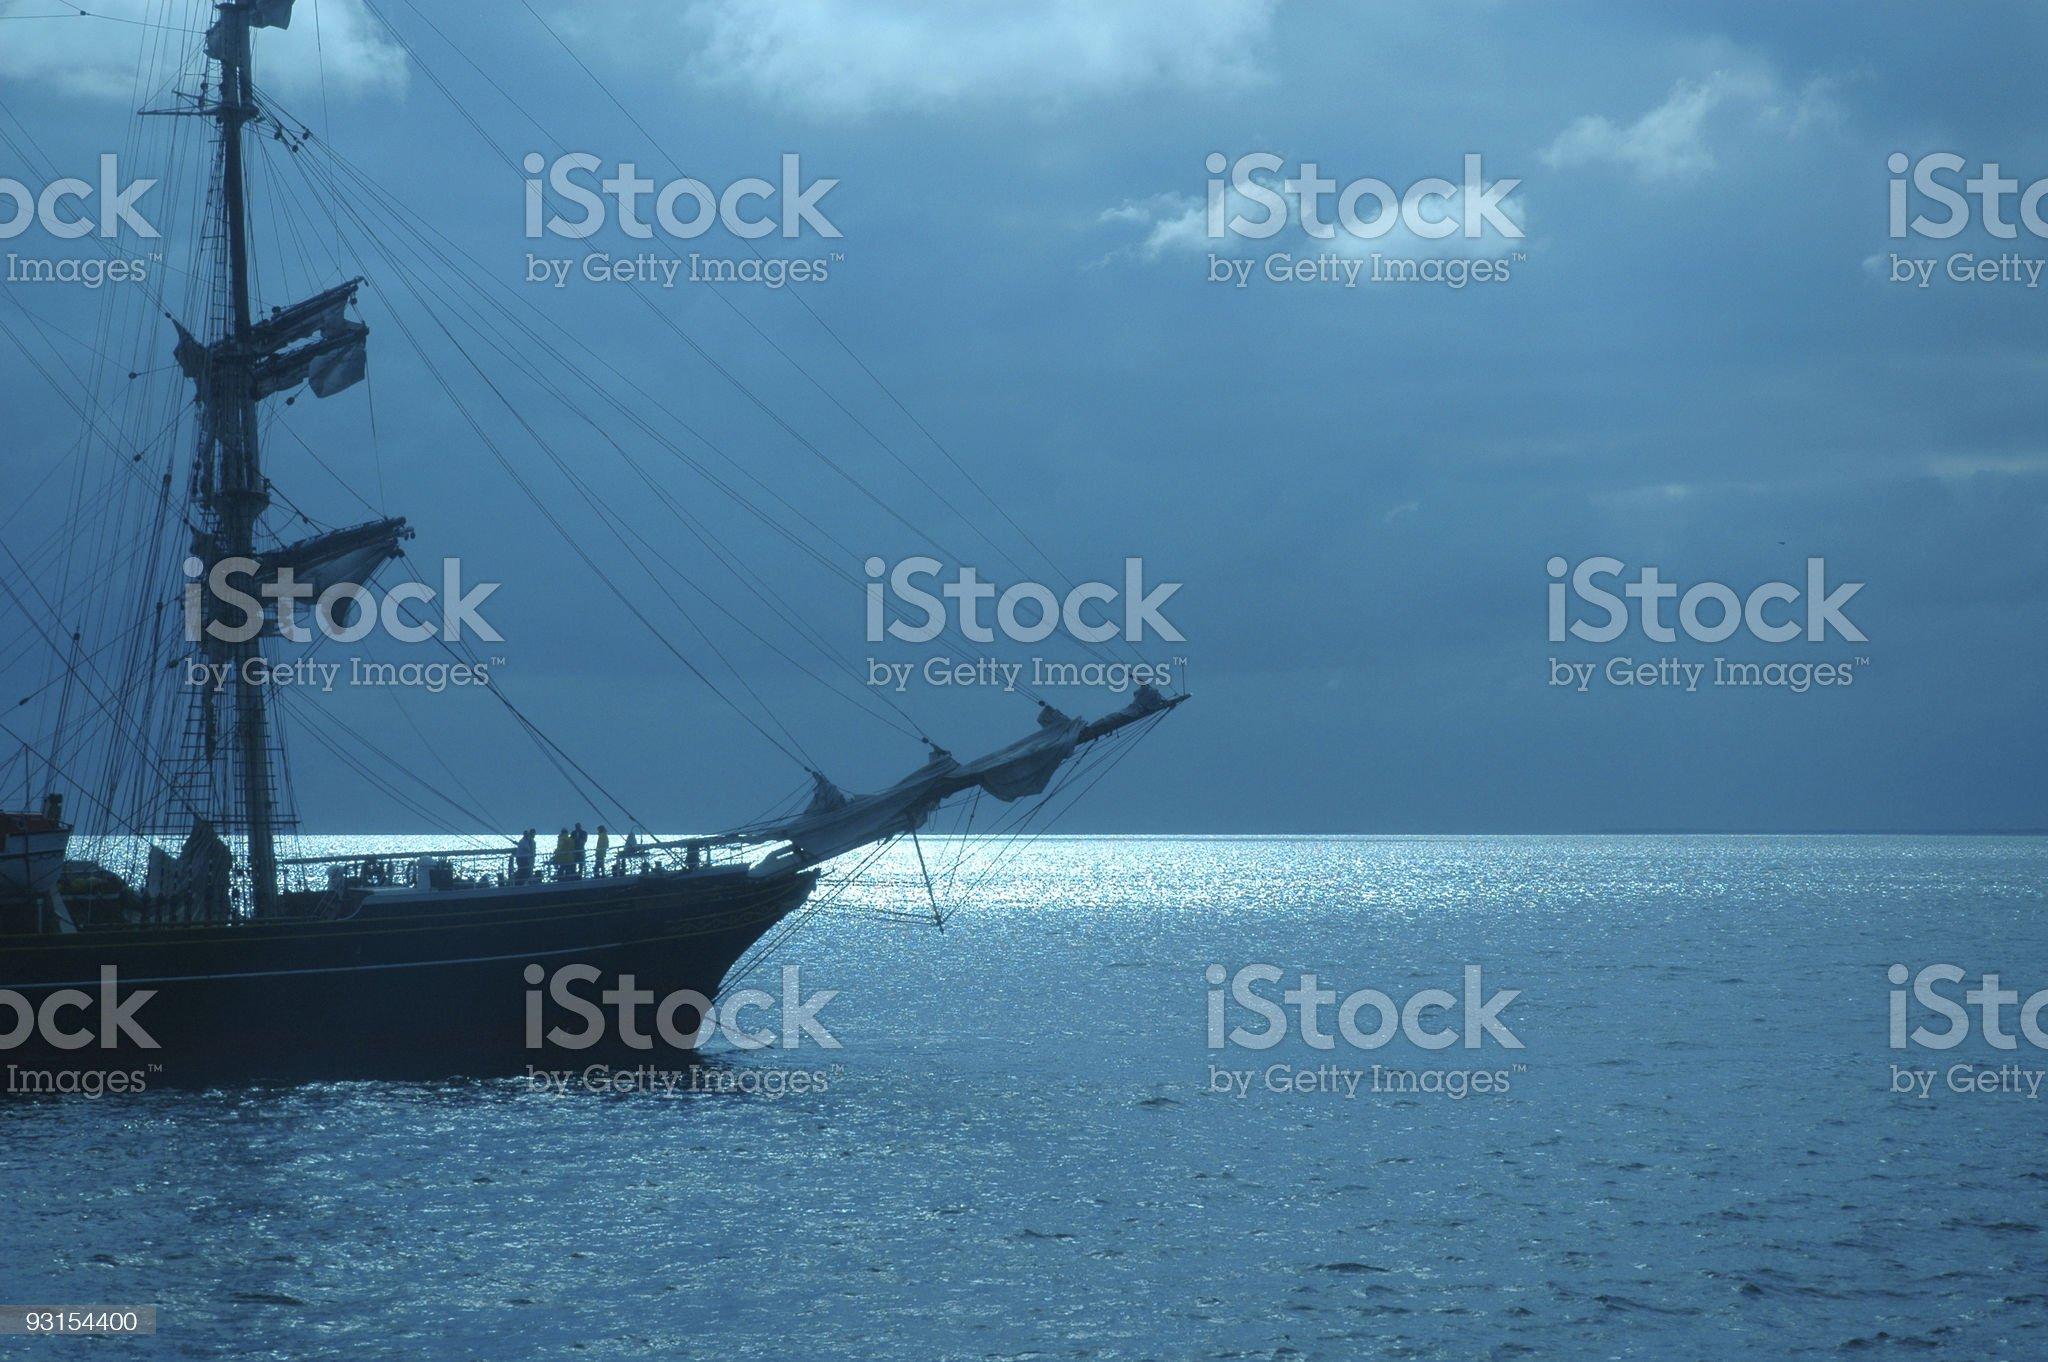 Tallship at night with moonlight reflecting royalty-free stock photo